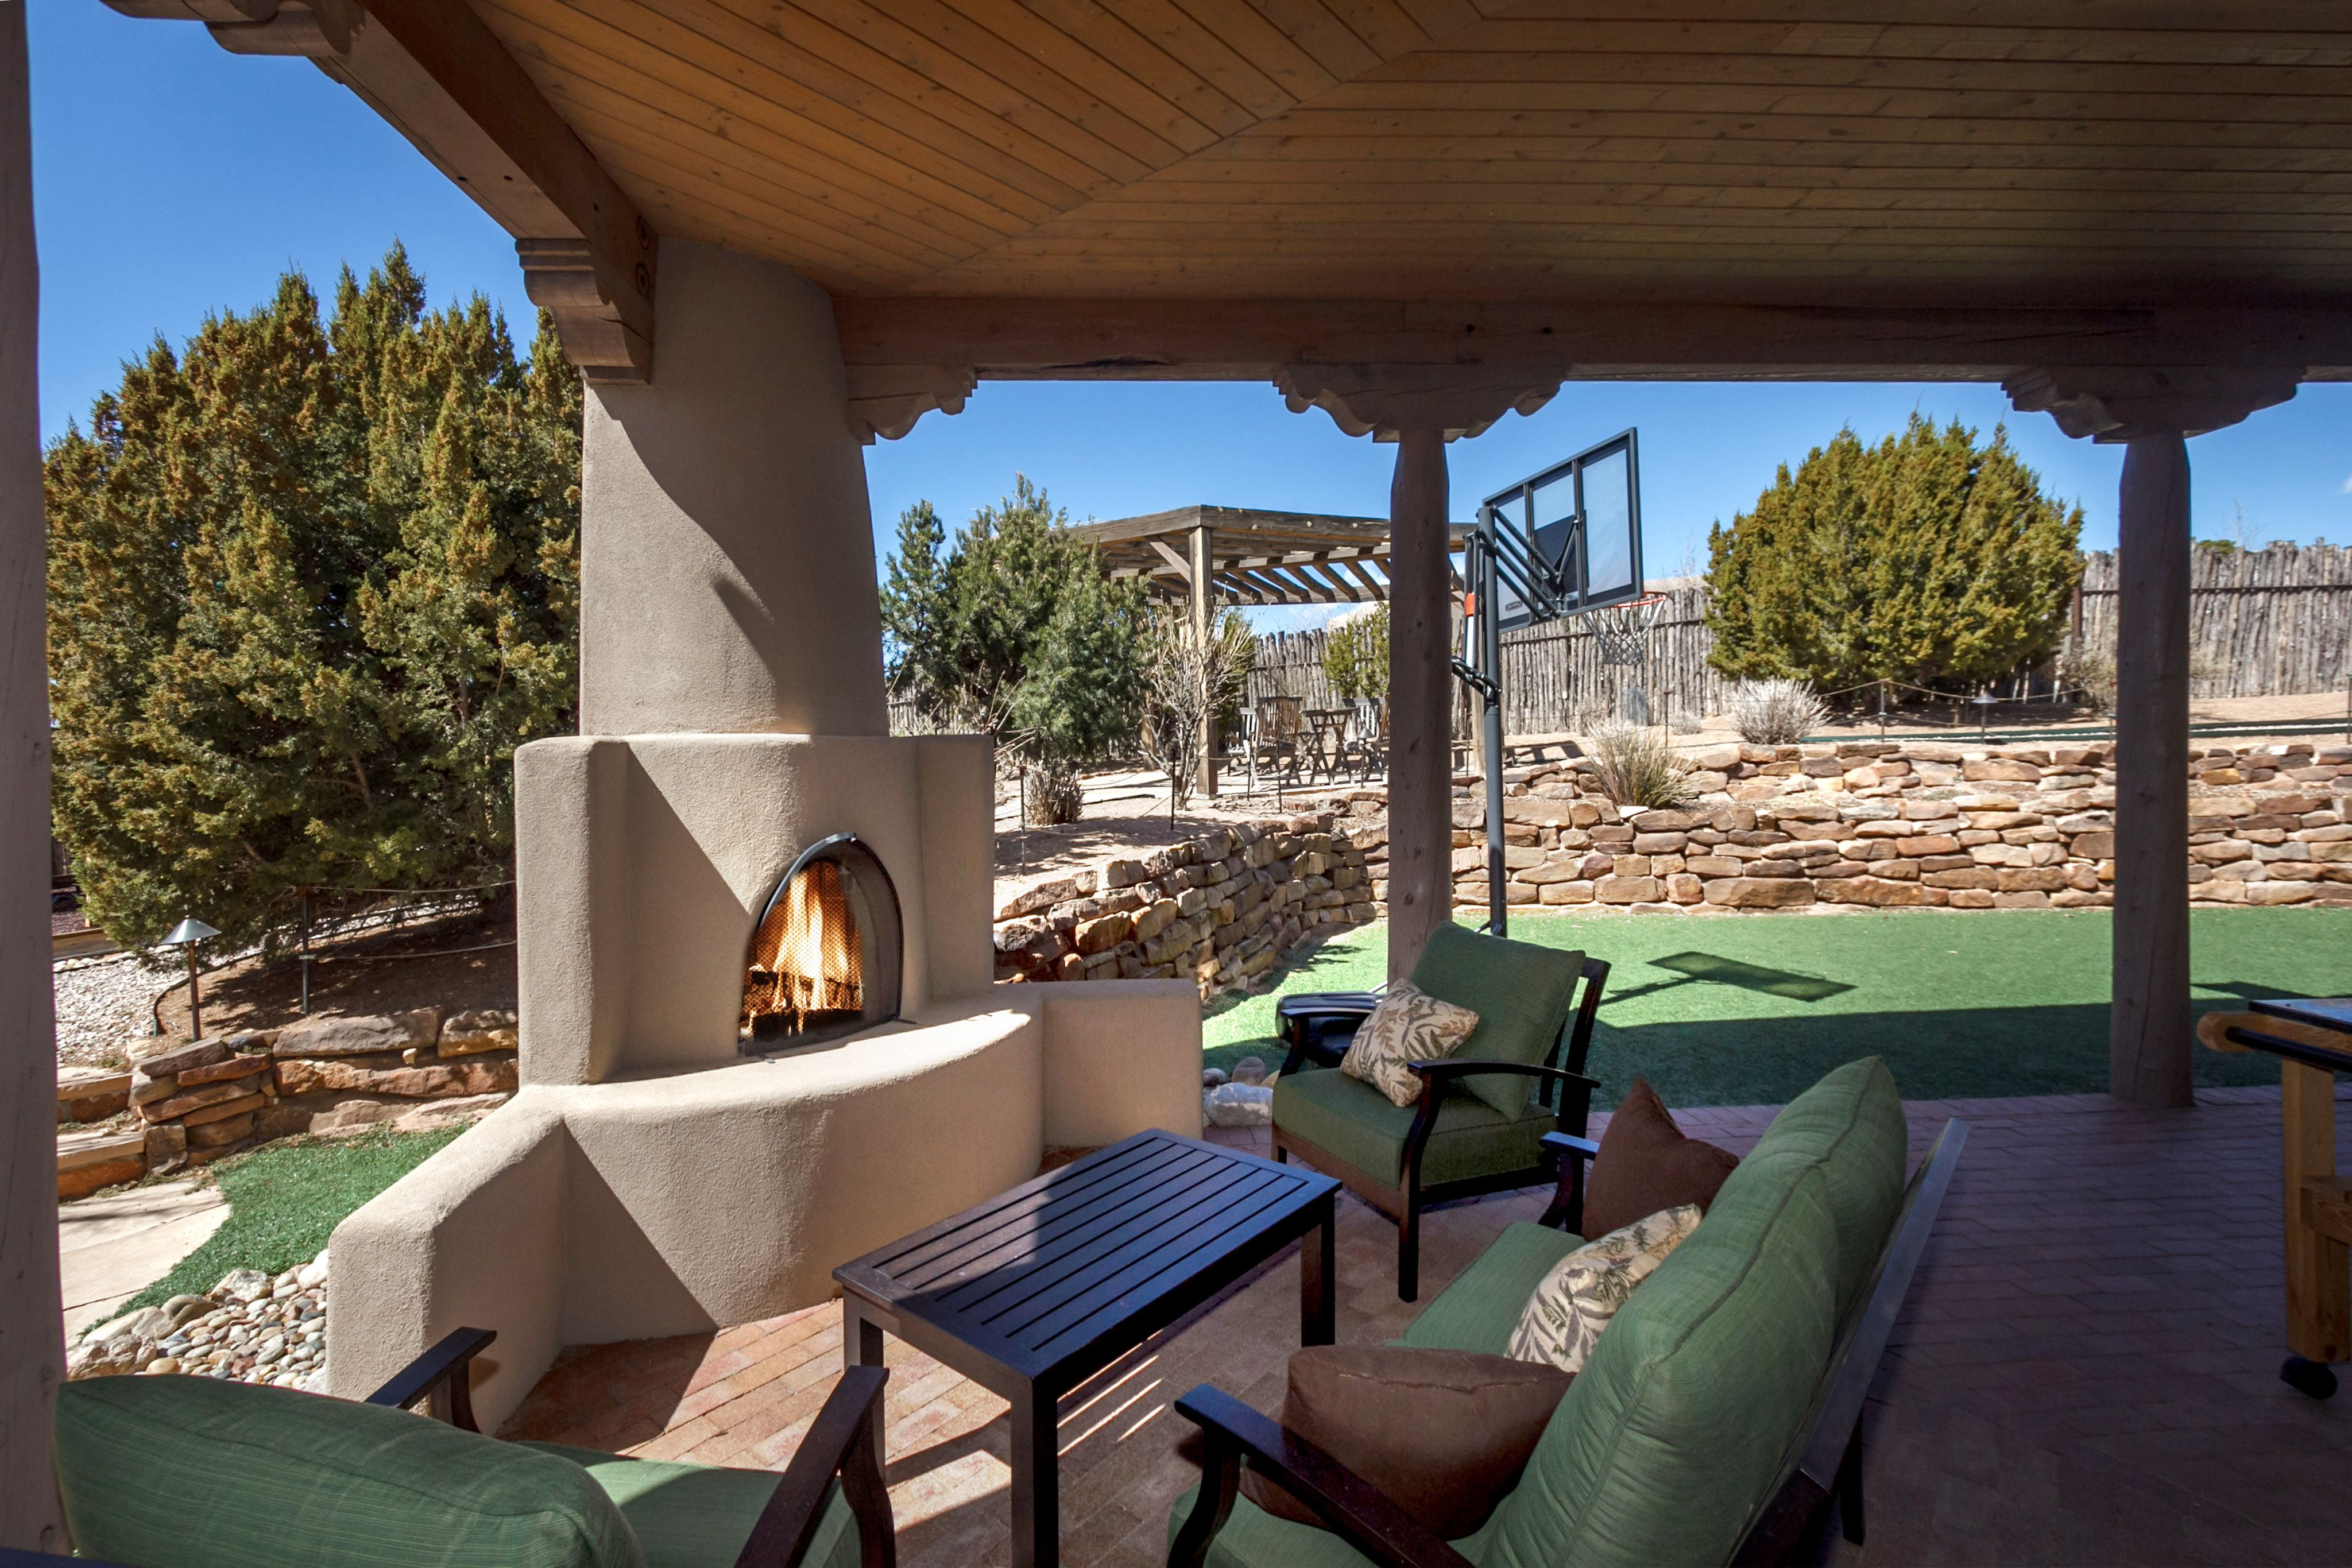 santa fe real estate outdoor fireplace homes in santa fe 6